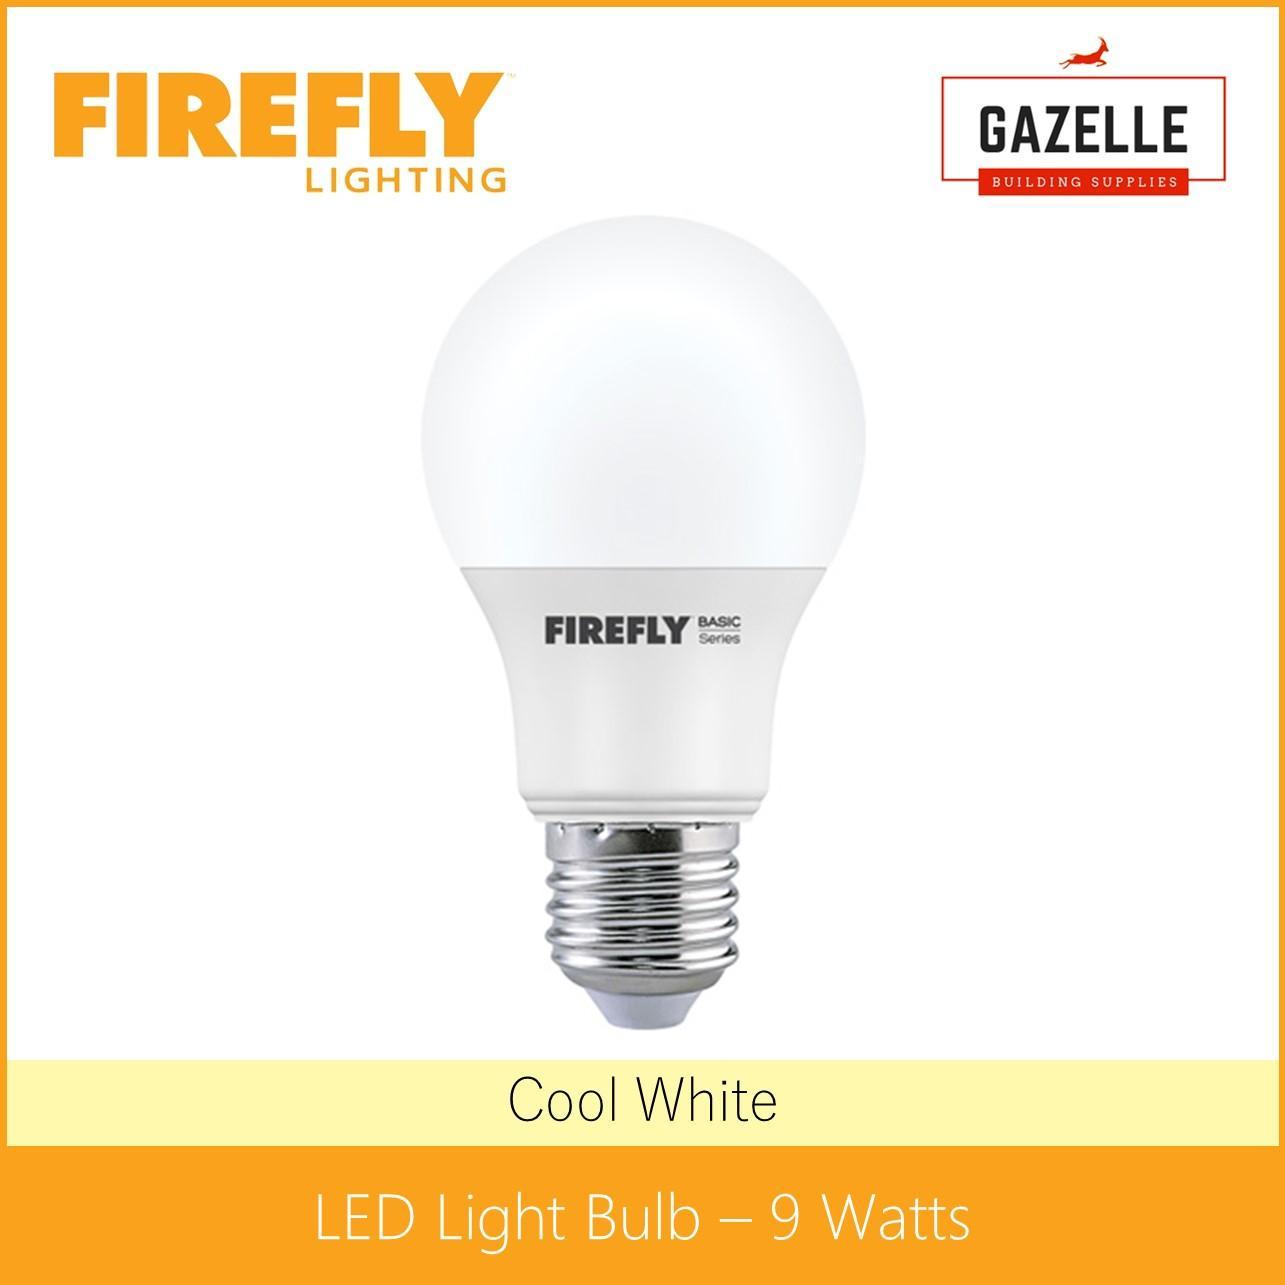 Firefly Basic Series Led Bulb Cool White 9 Watts